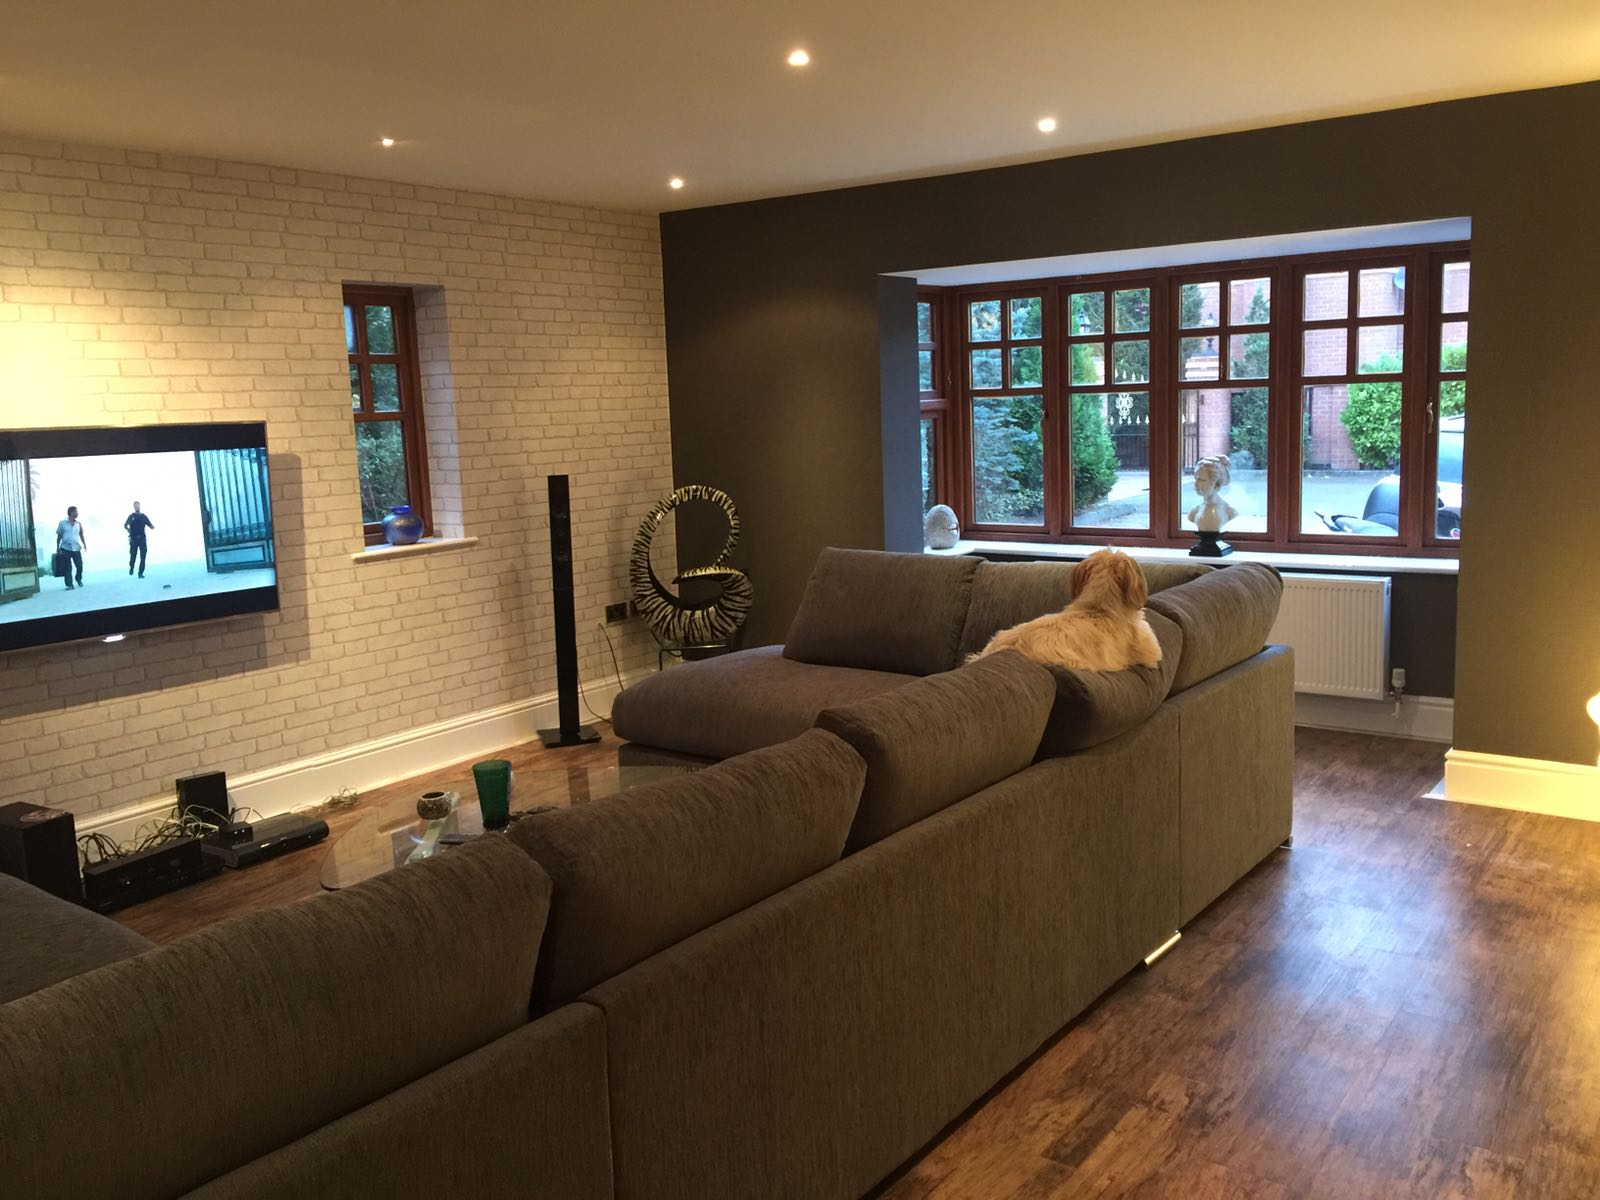 Interior Decorator Job decorator lichfield | parkes interior decorating